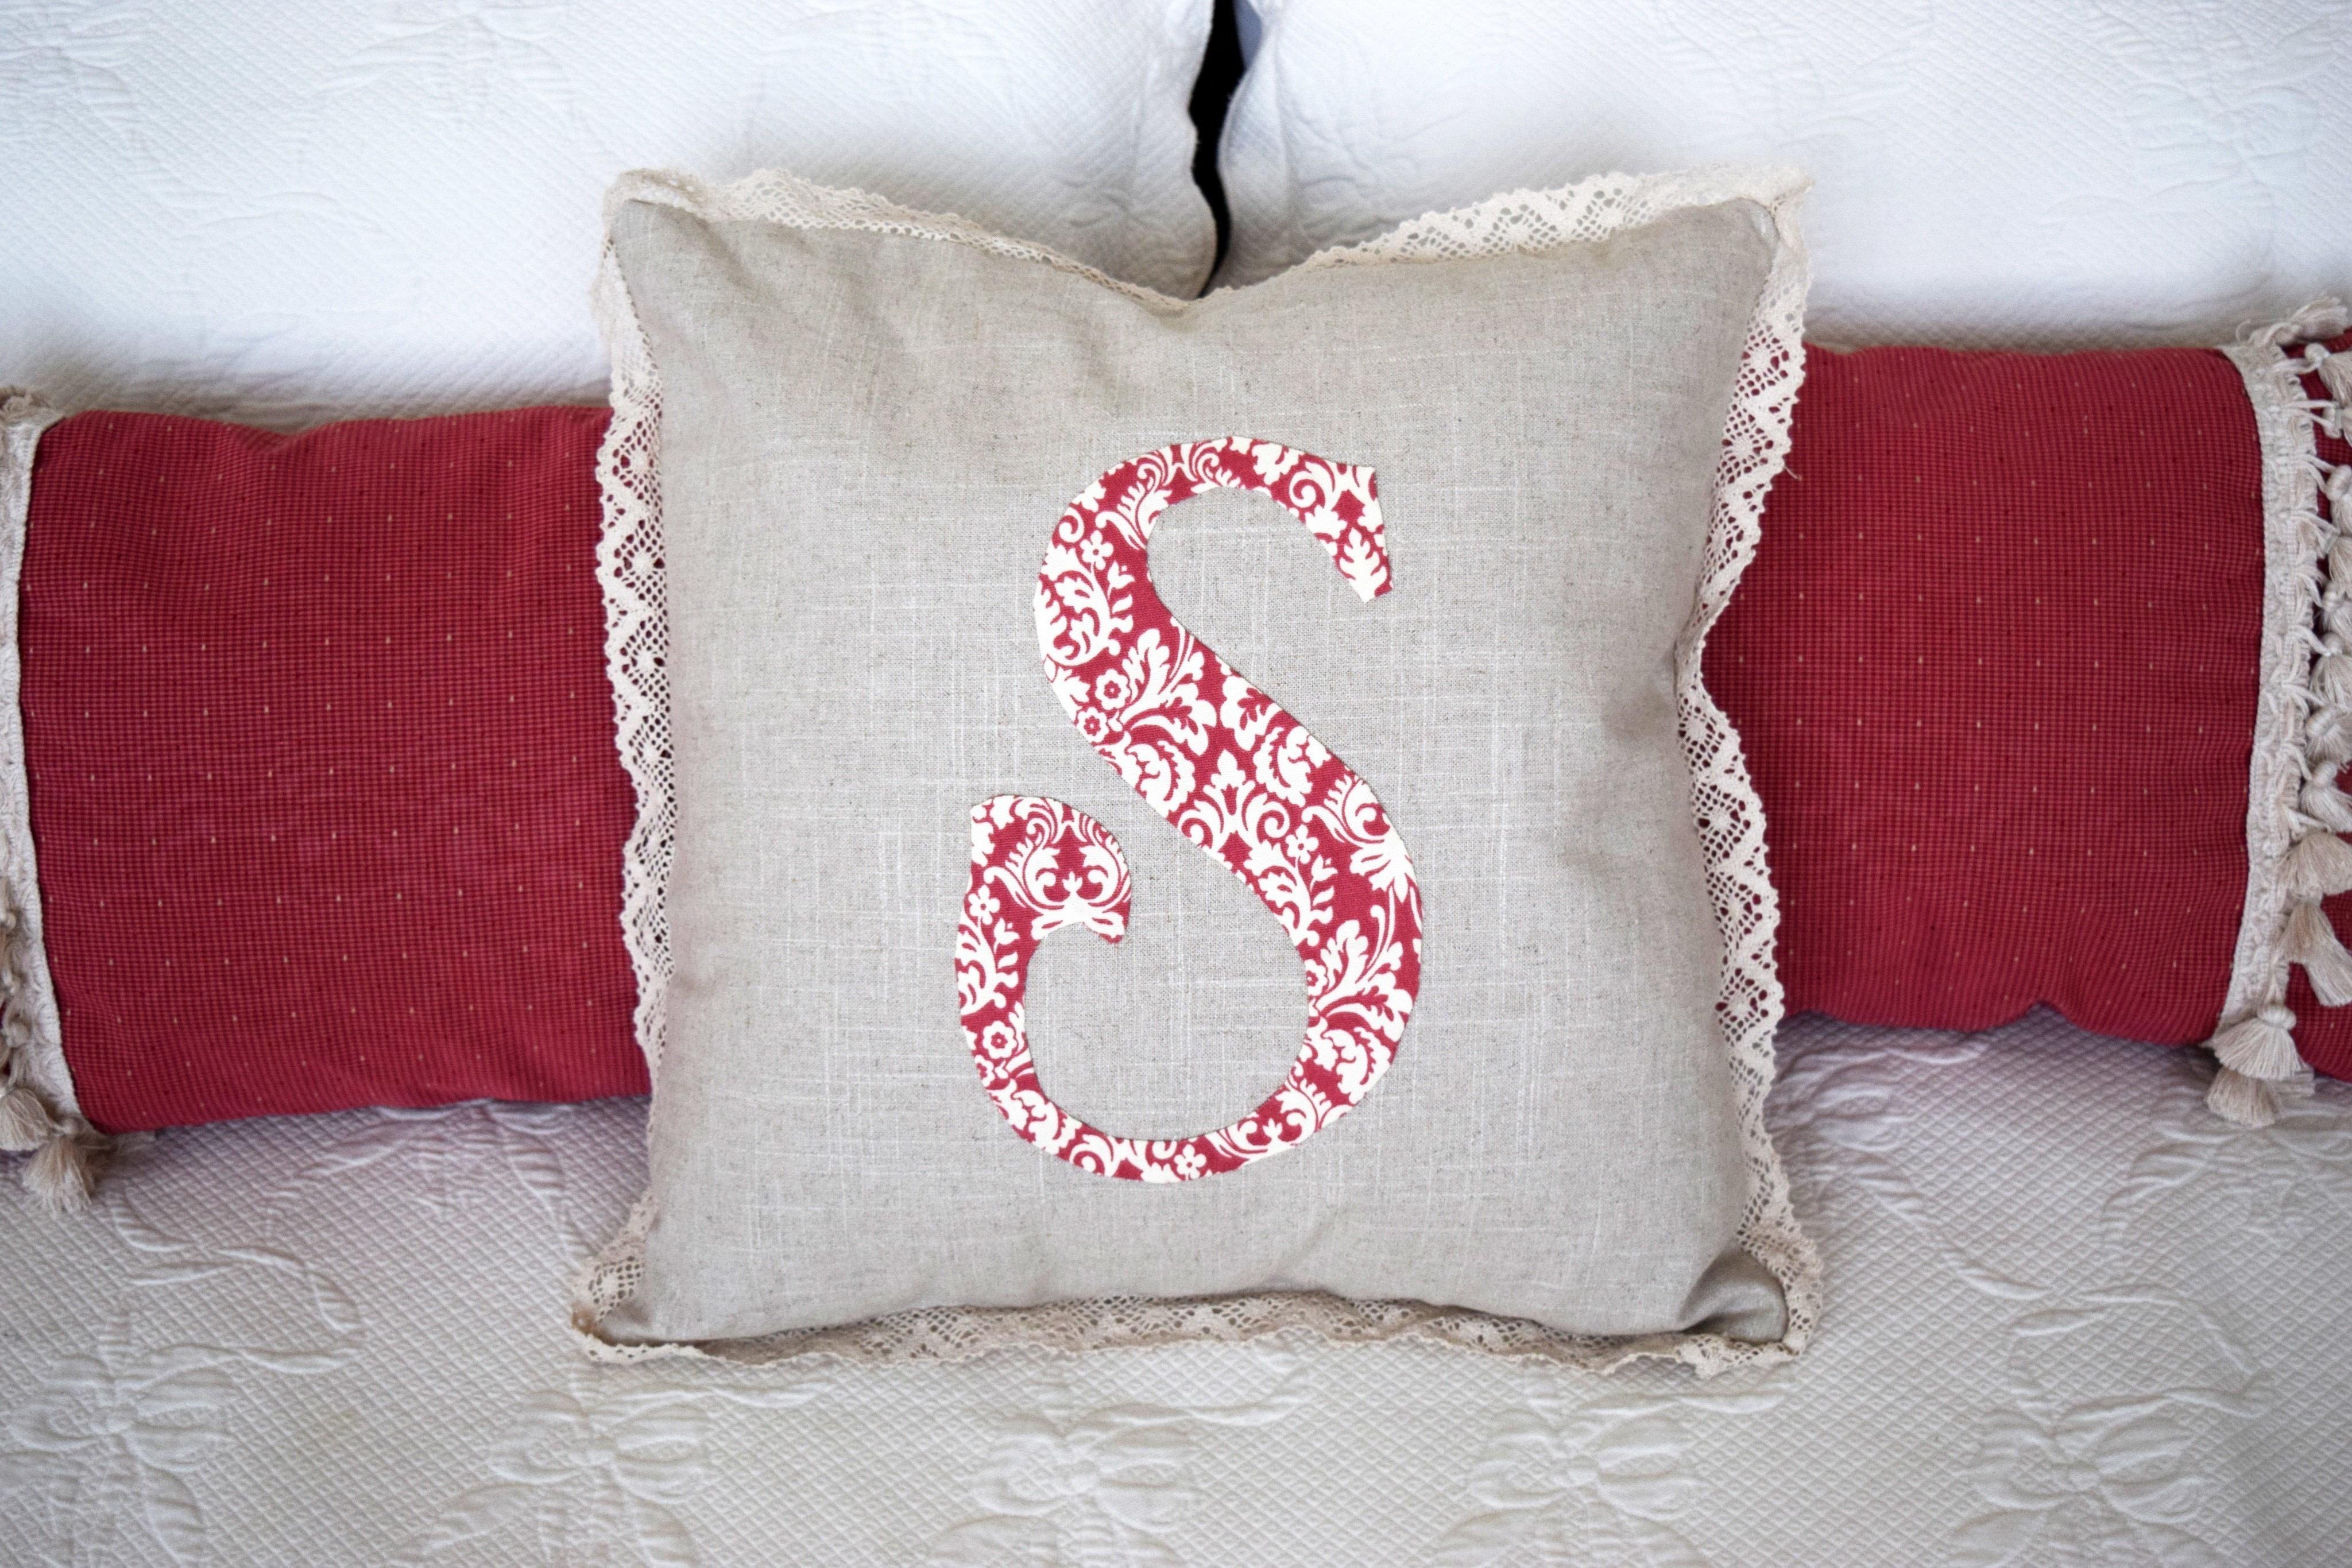 appliqued monogram pillow  u00b7 how to sew an applique cushion  u00b7 sewing on cut out   keep